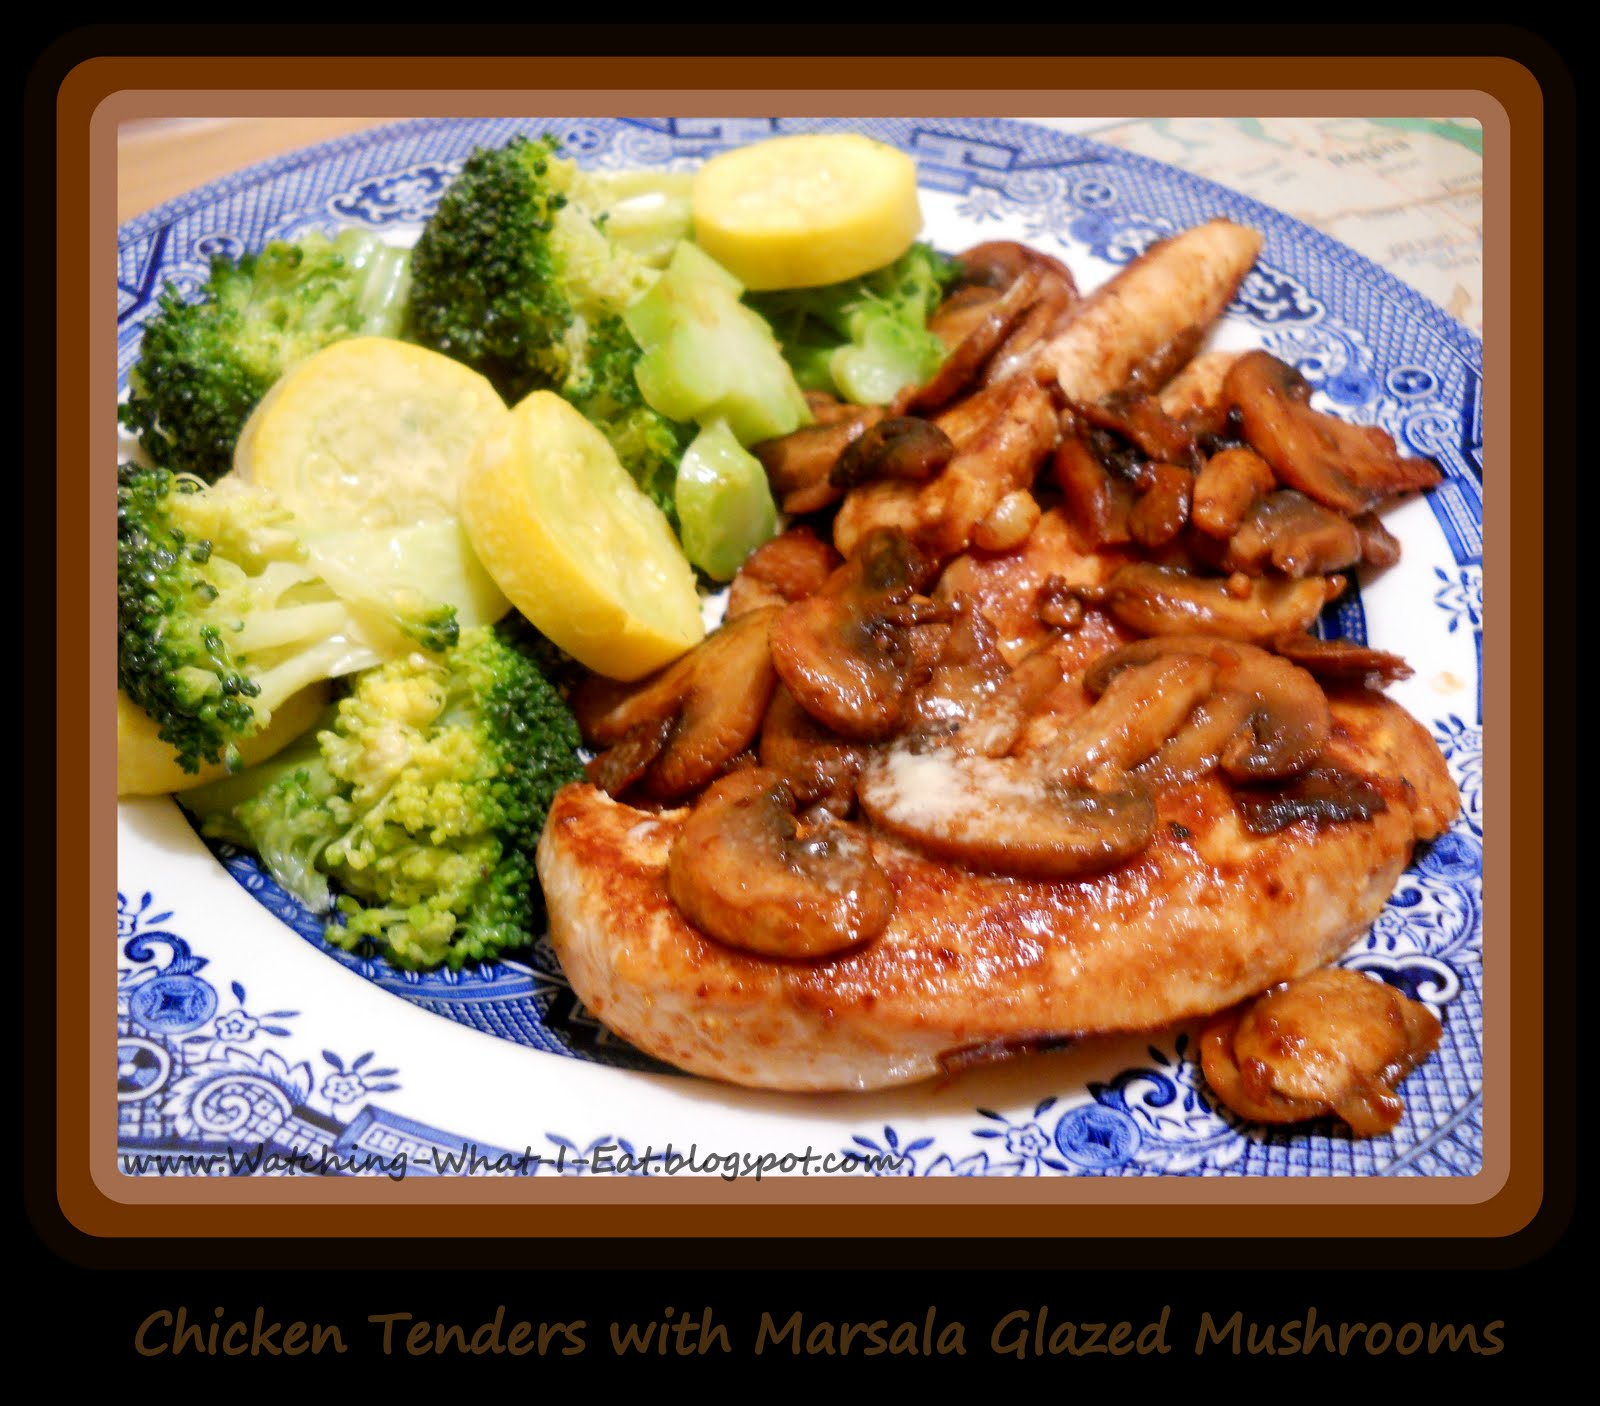 Chicken Tenders with Marsala Glazed Mushrooms